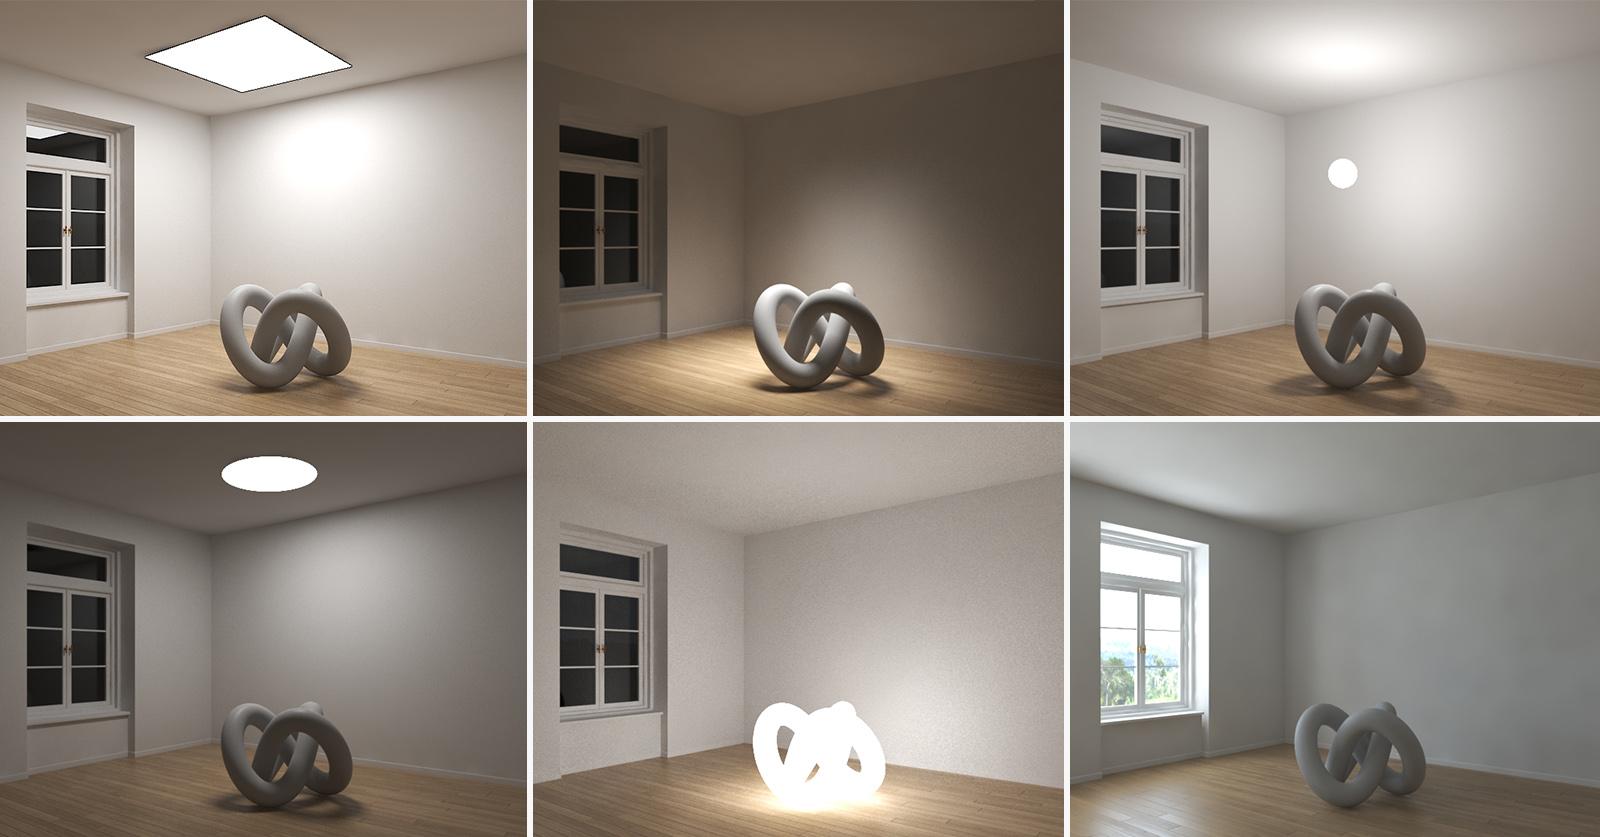 Omówienie świateł V-ray Light - 3ds Max - Poradnik - Blog